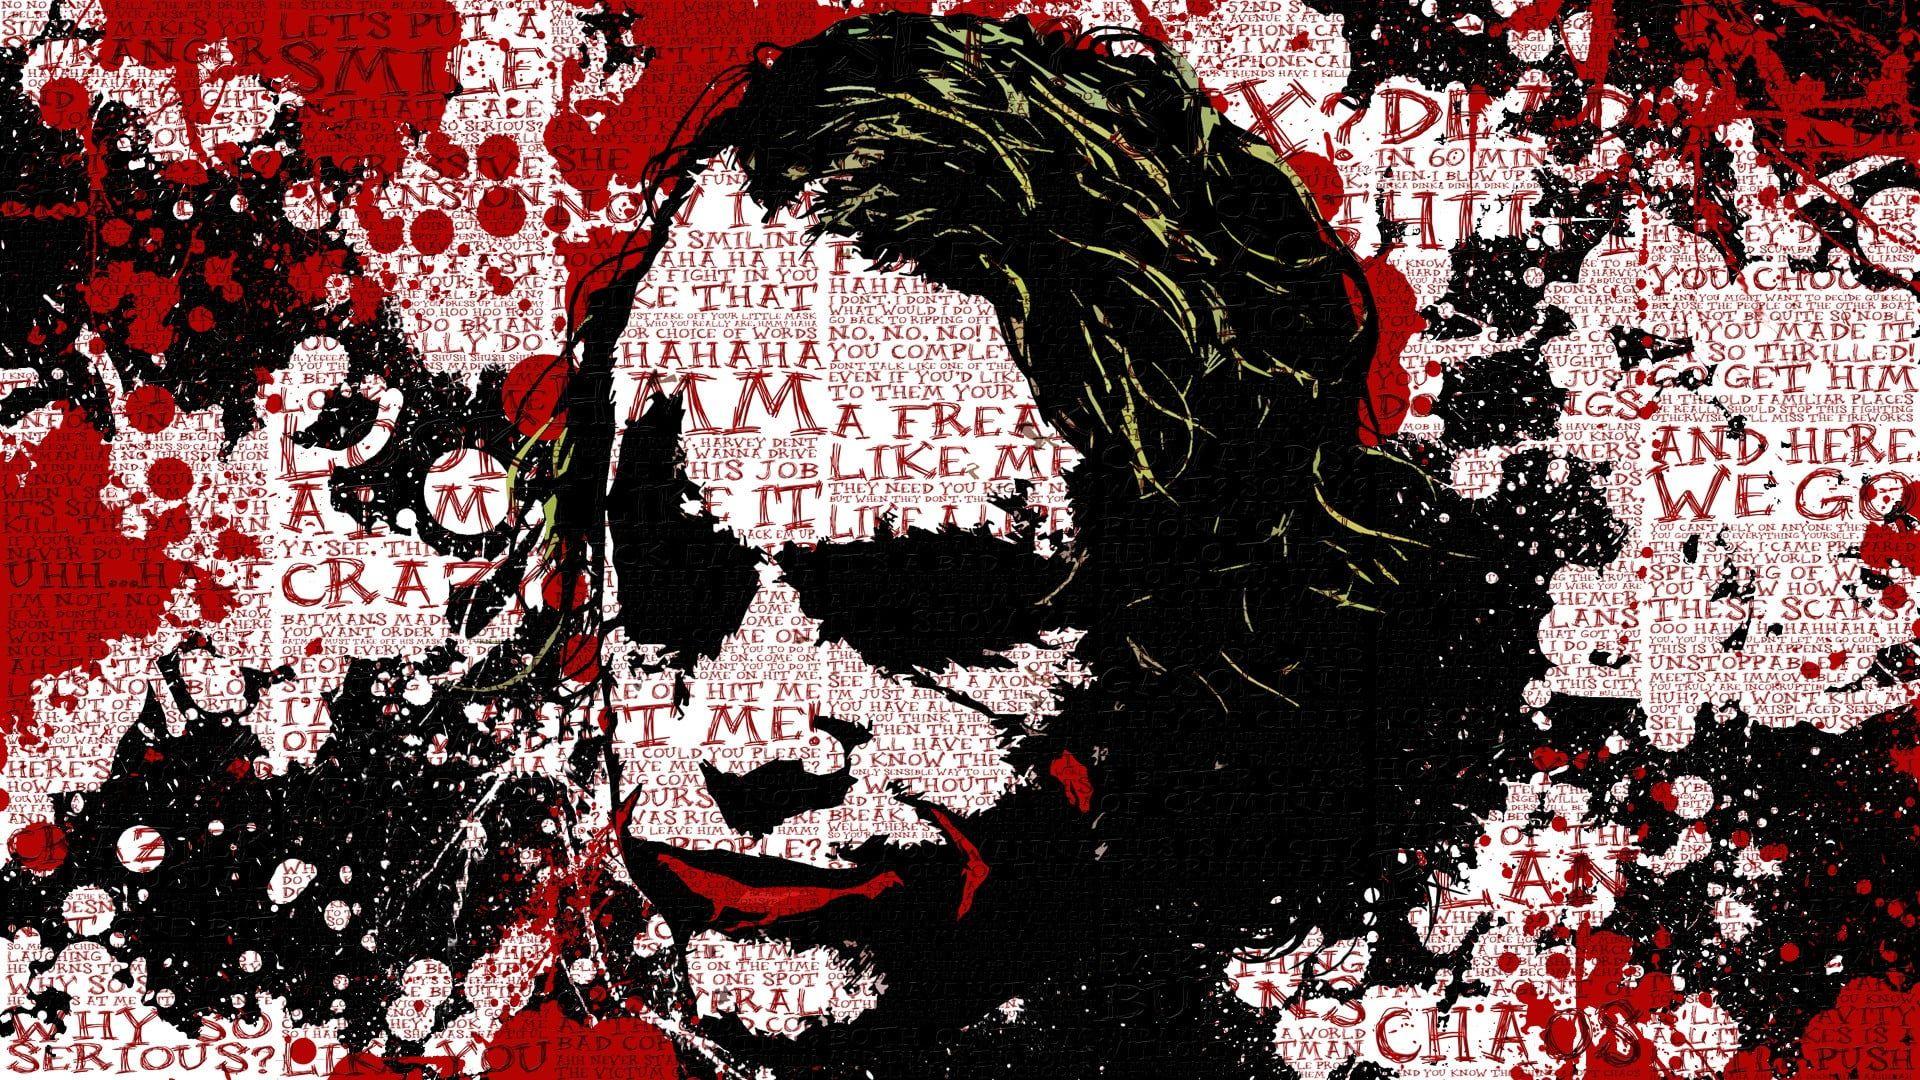 The Joker Digital Wallpaper Batman Anime Movies Joker Paint Splatter Typography The Dark Knight Di Joker Wallpapers Joker Hd Wallpapers Joker Hd Wallpaper